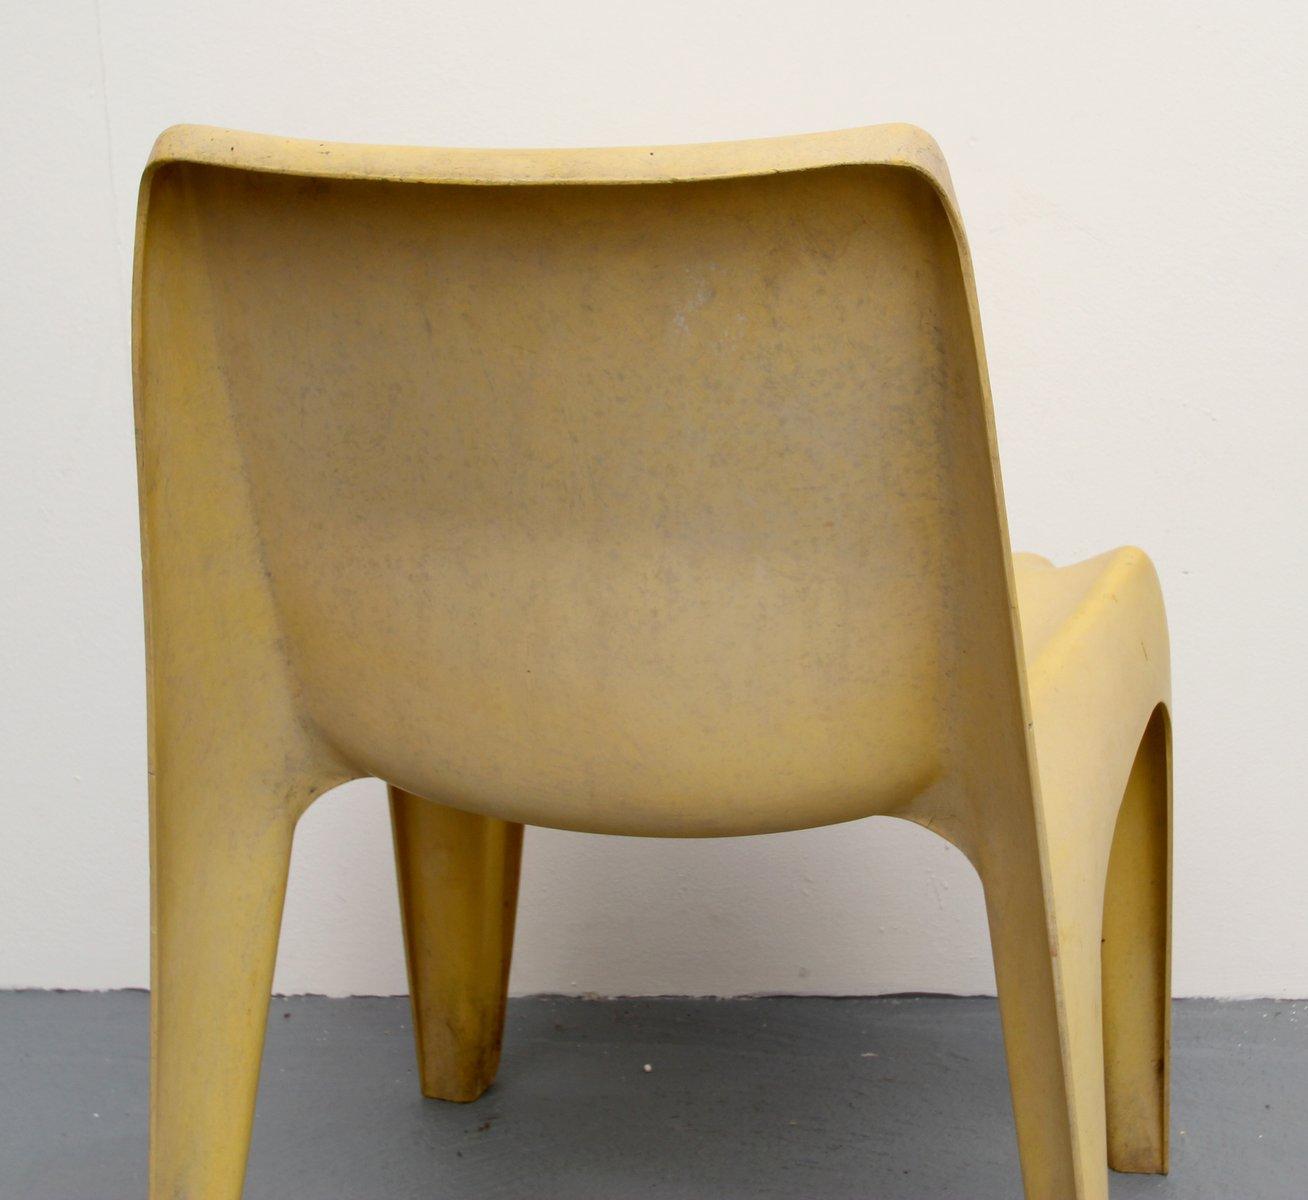 ba 1171 fiberglas stuhl von helmut b tzner f r bofinger 1960er bei pamono kaufen. Black Bedroom Furniture Sets. Home Design Ideas